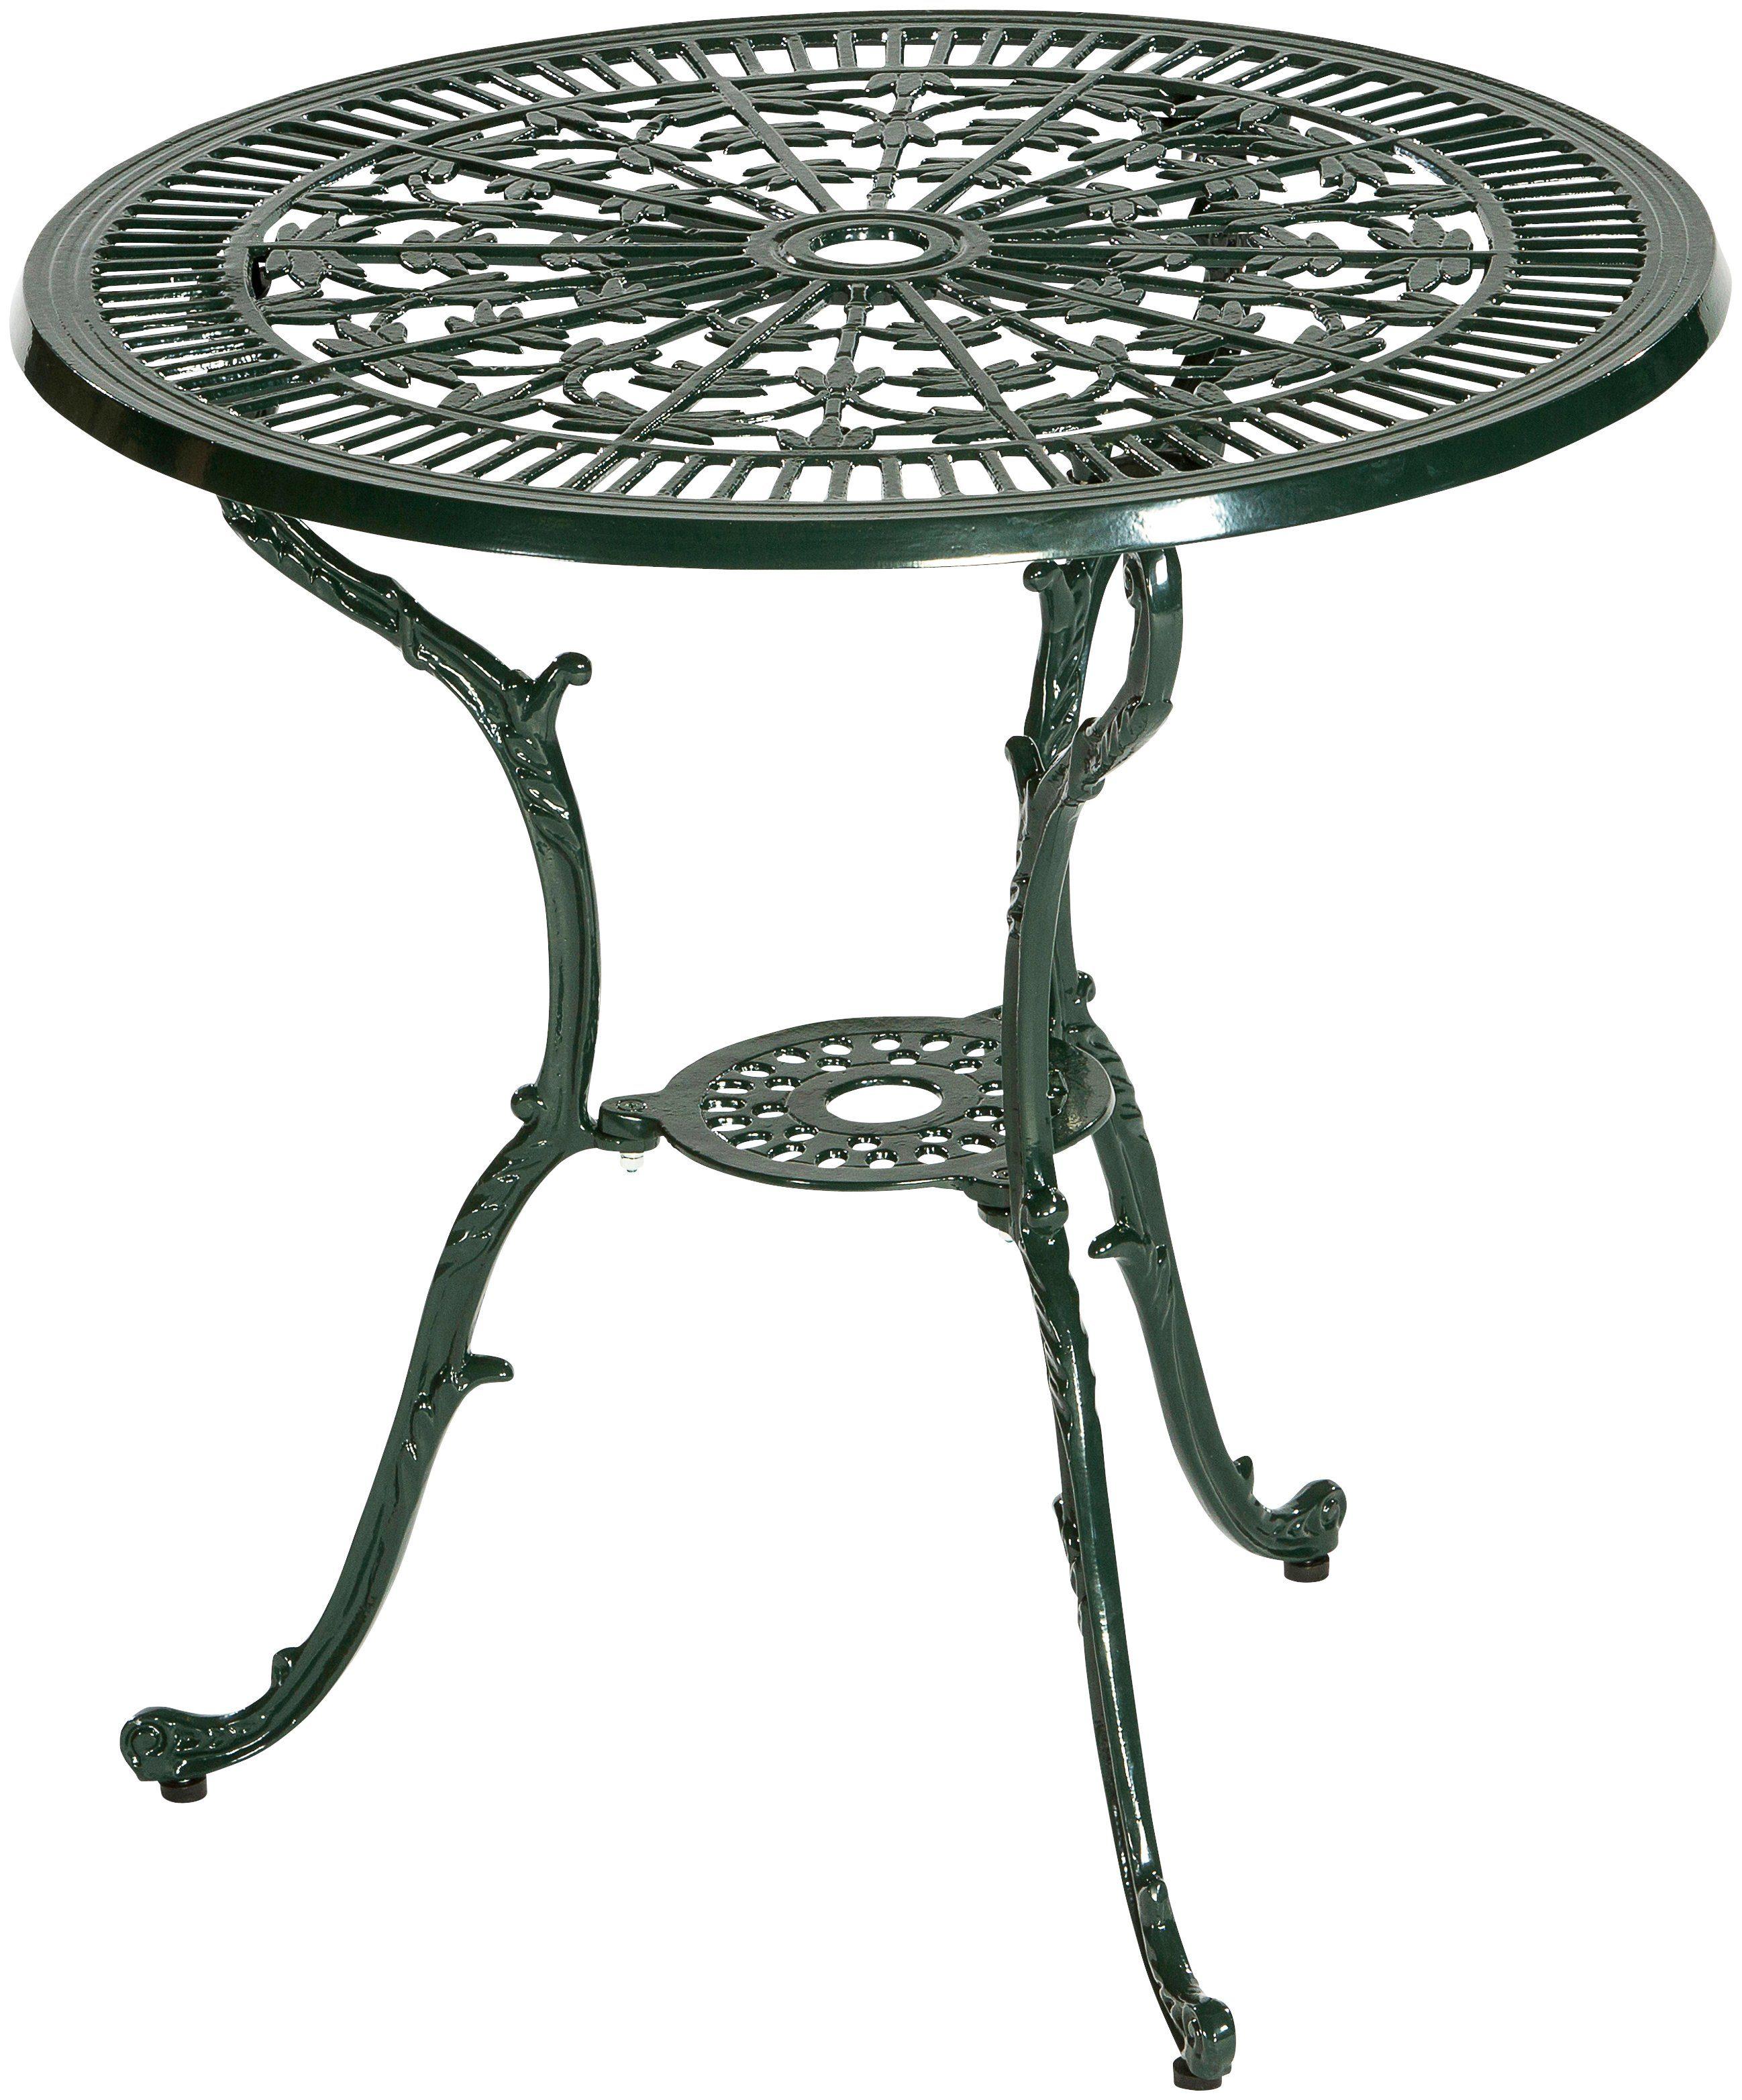 MERXX Gartentisch »Lugano«, Aluminium, Ø 70 cm, grün